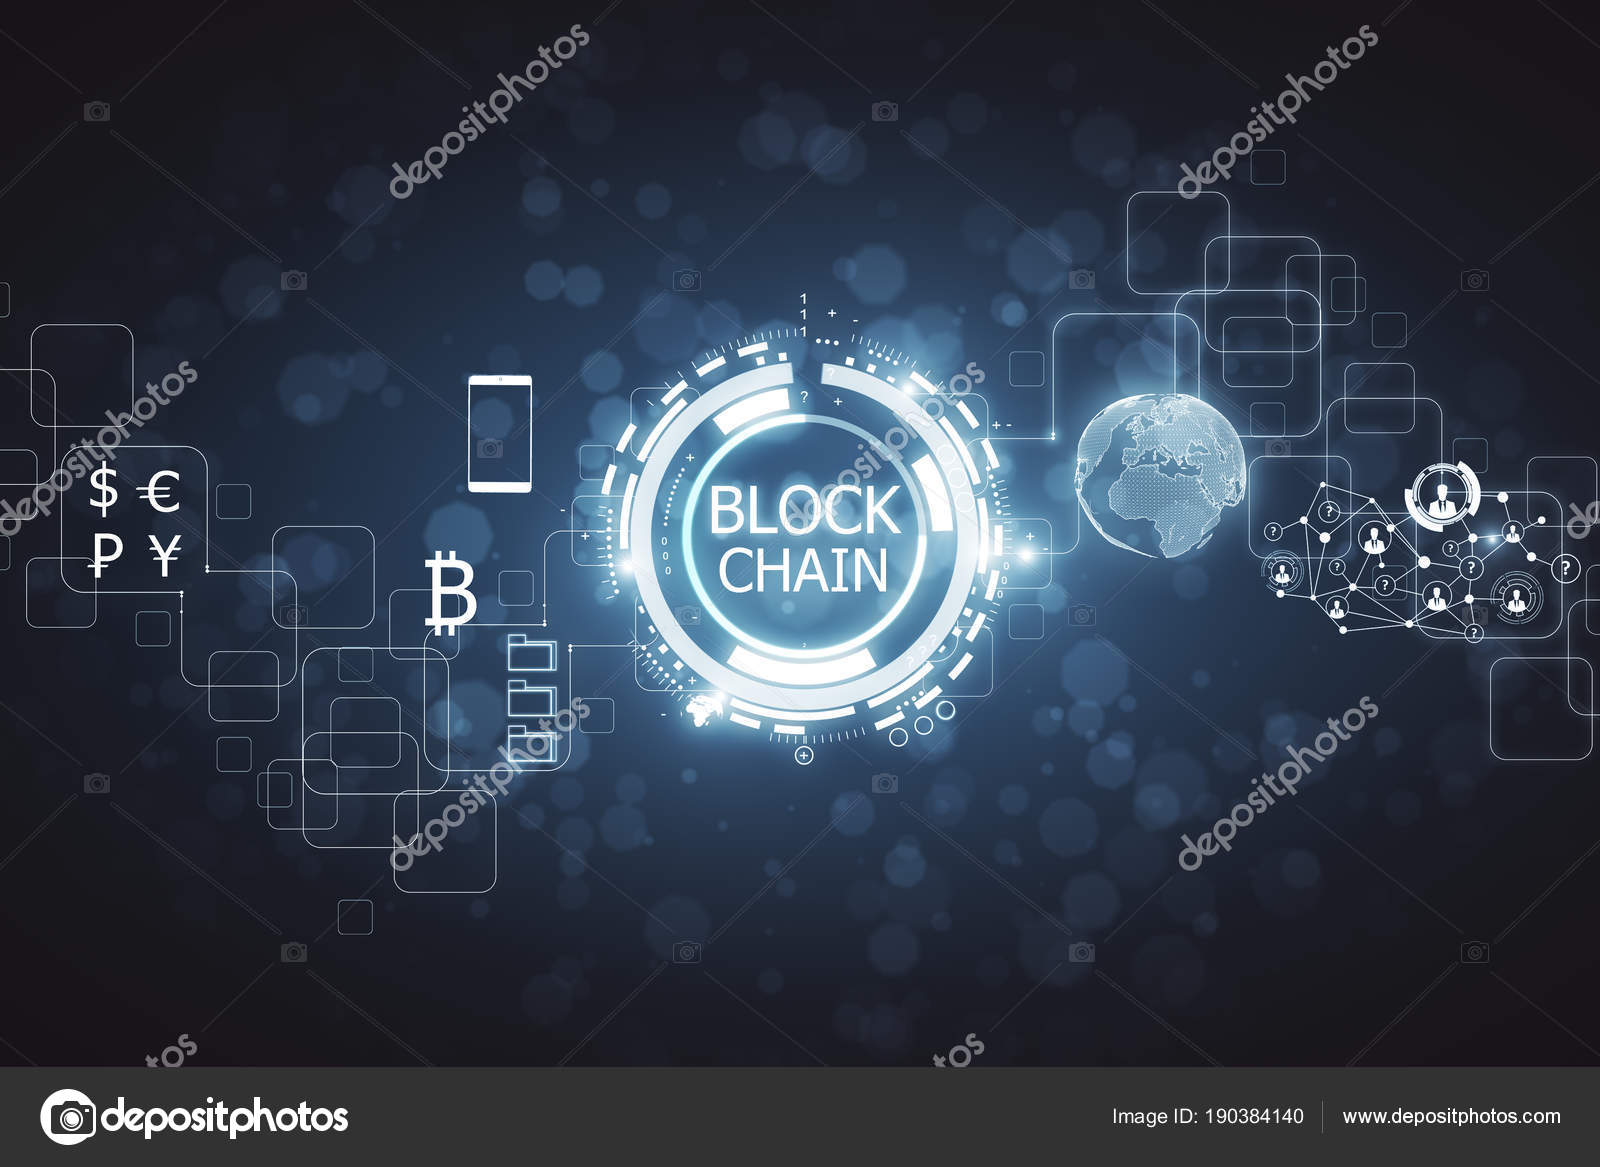 Abstract Blockchain Wallpaper Stock Photo